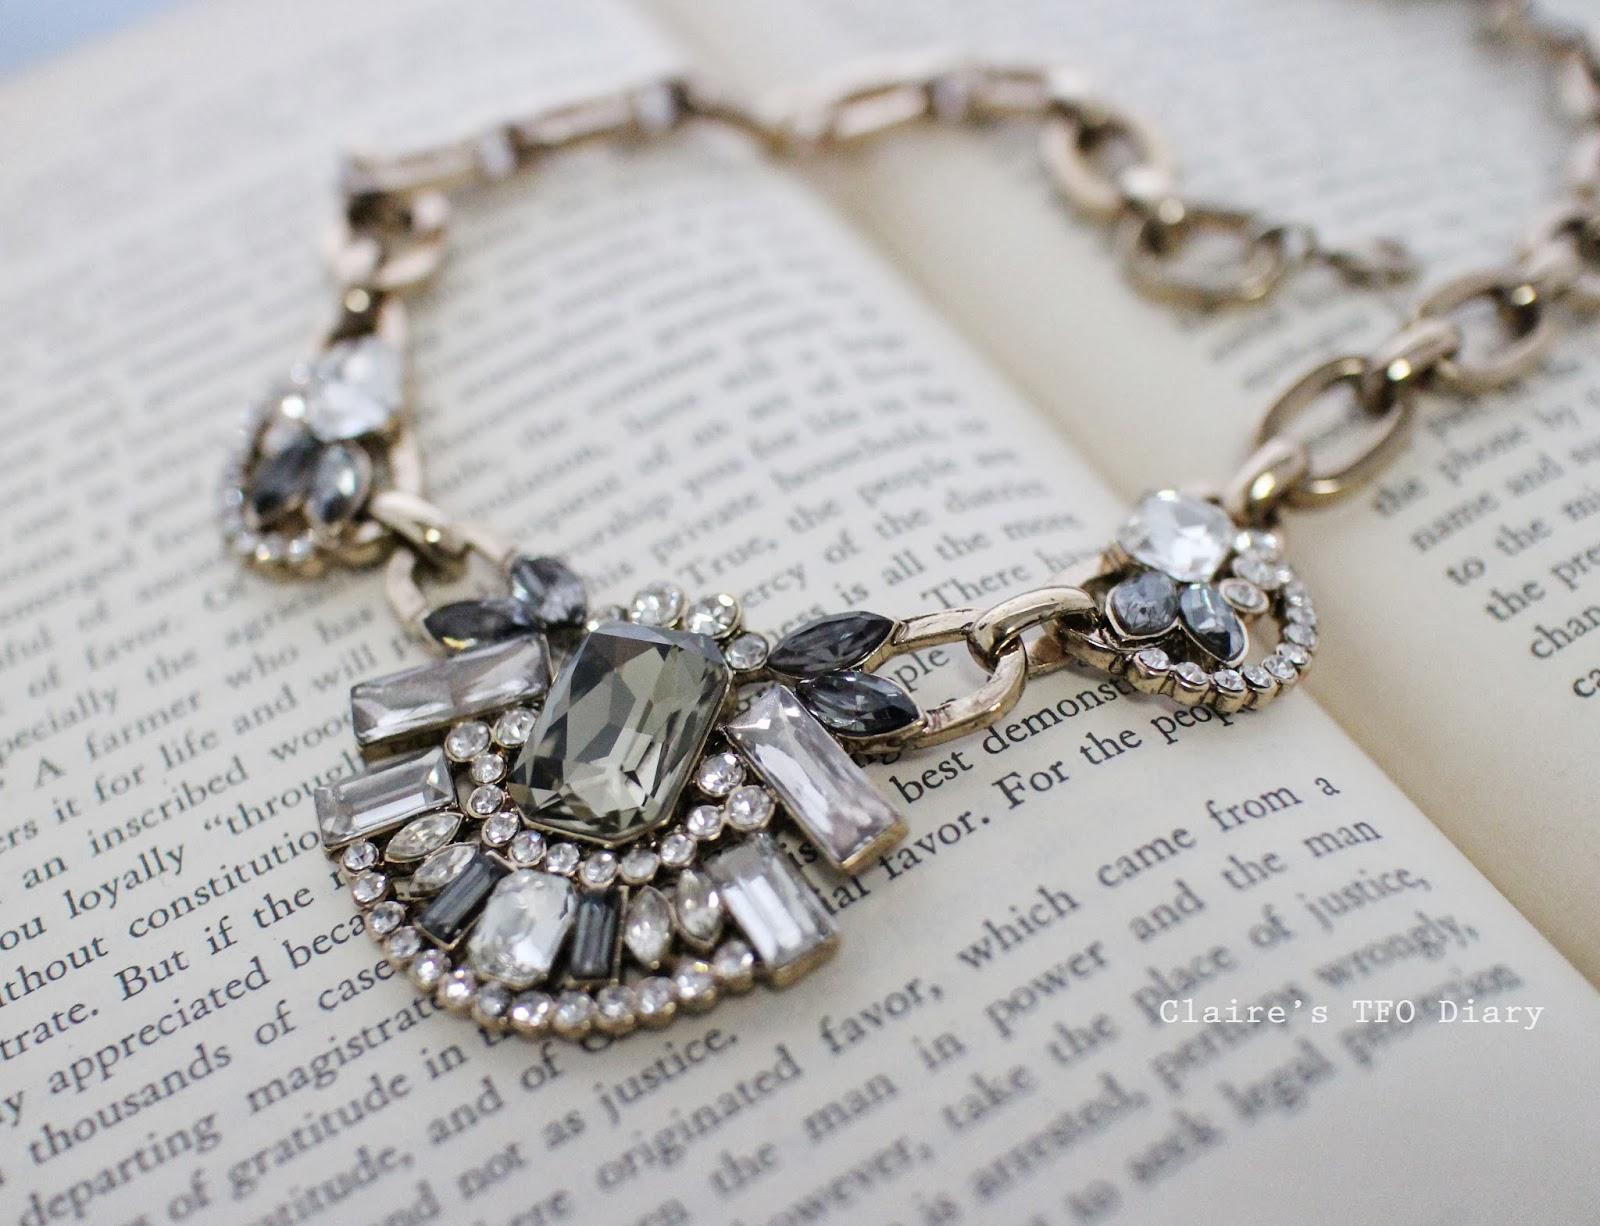 復古寶石項鍊 / Statement Necklace